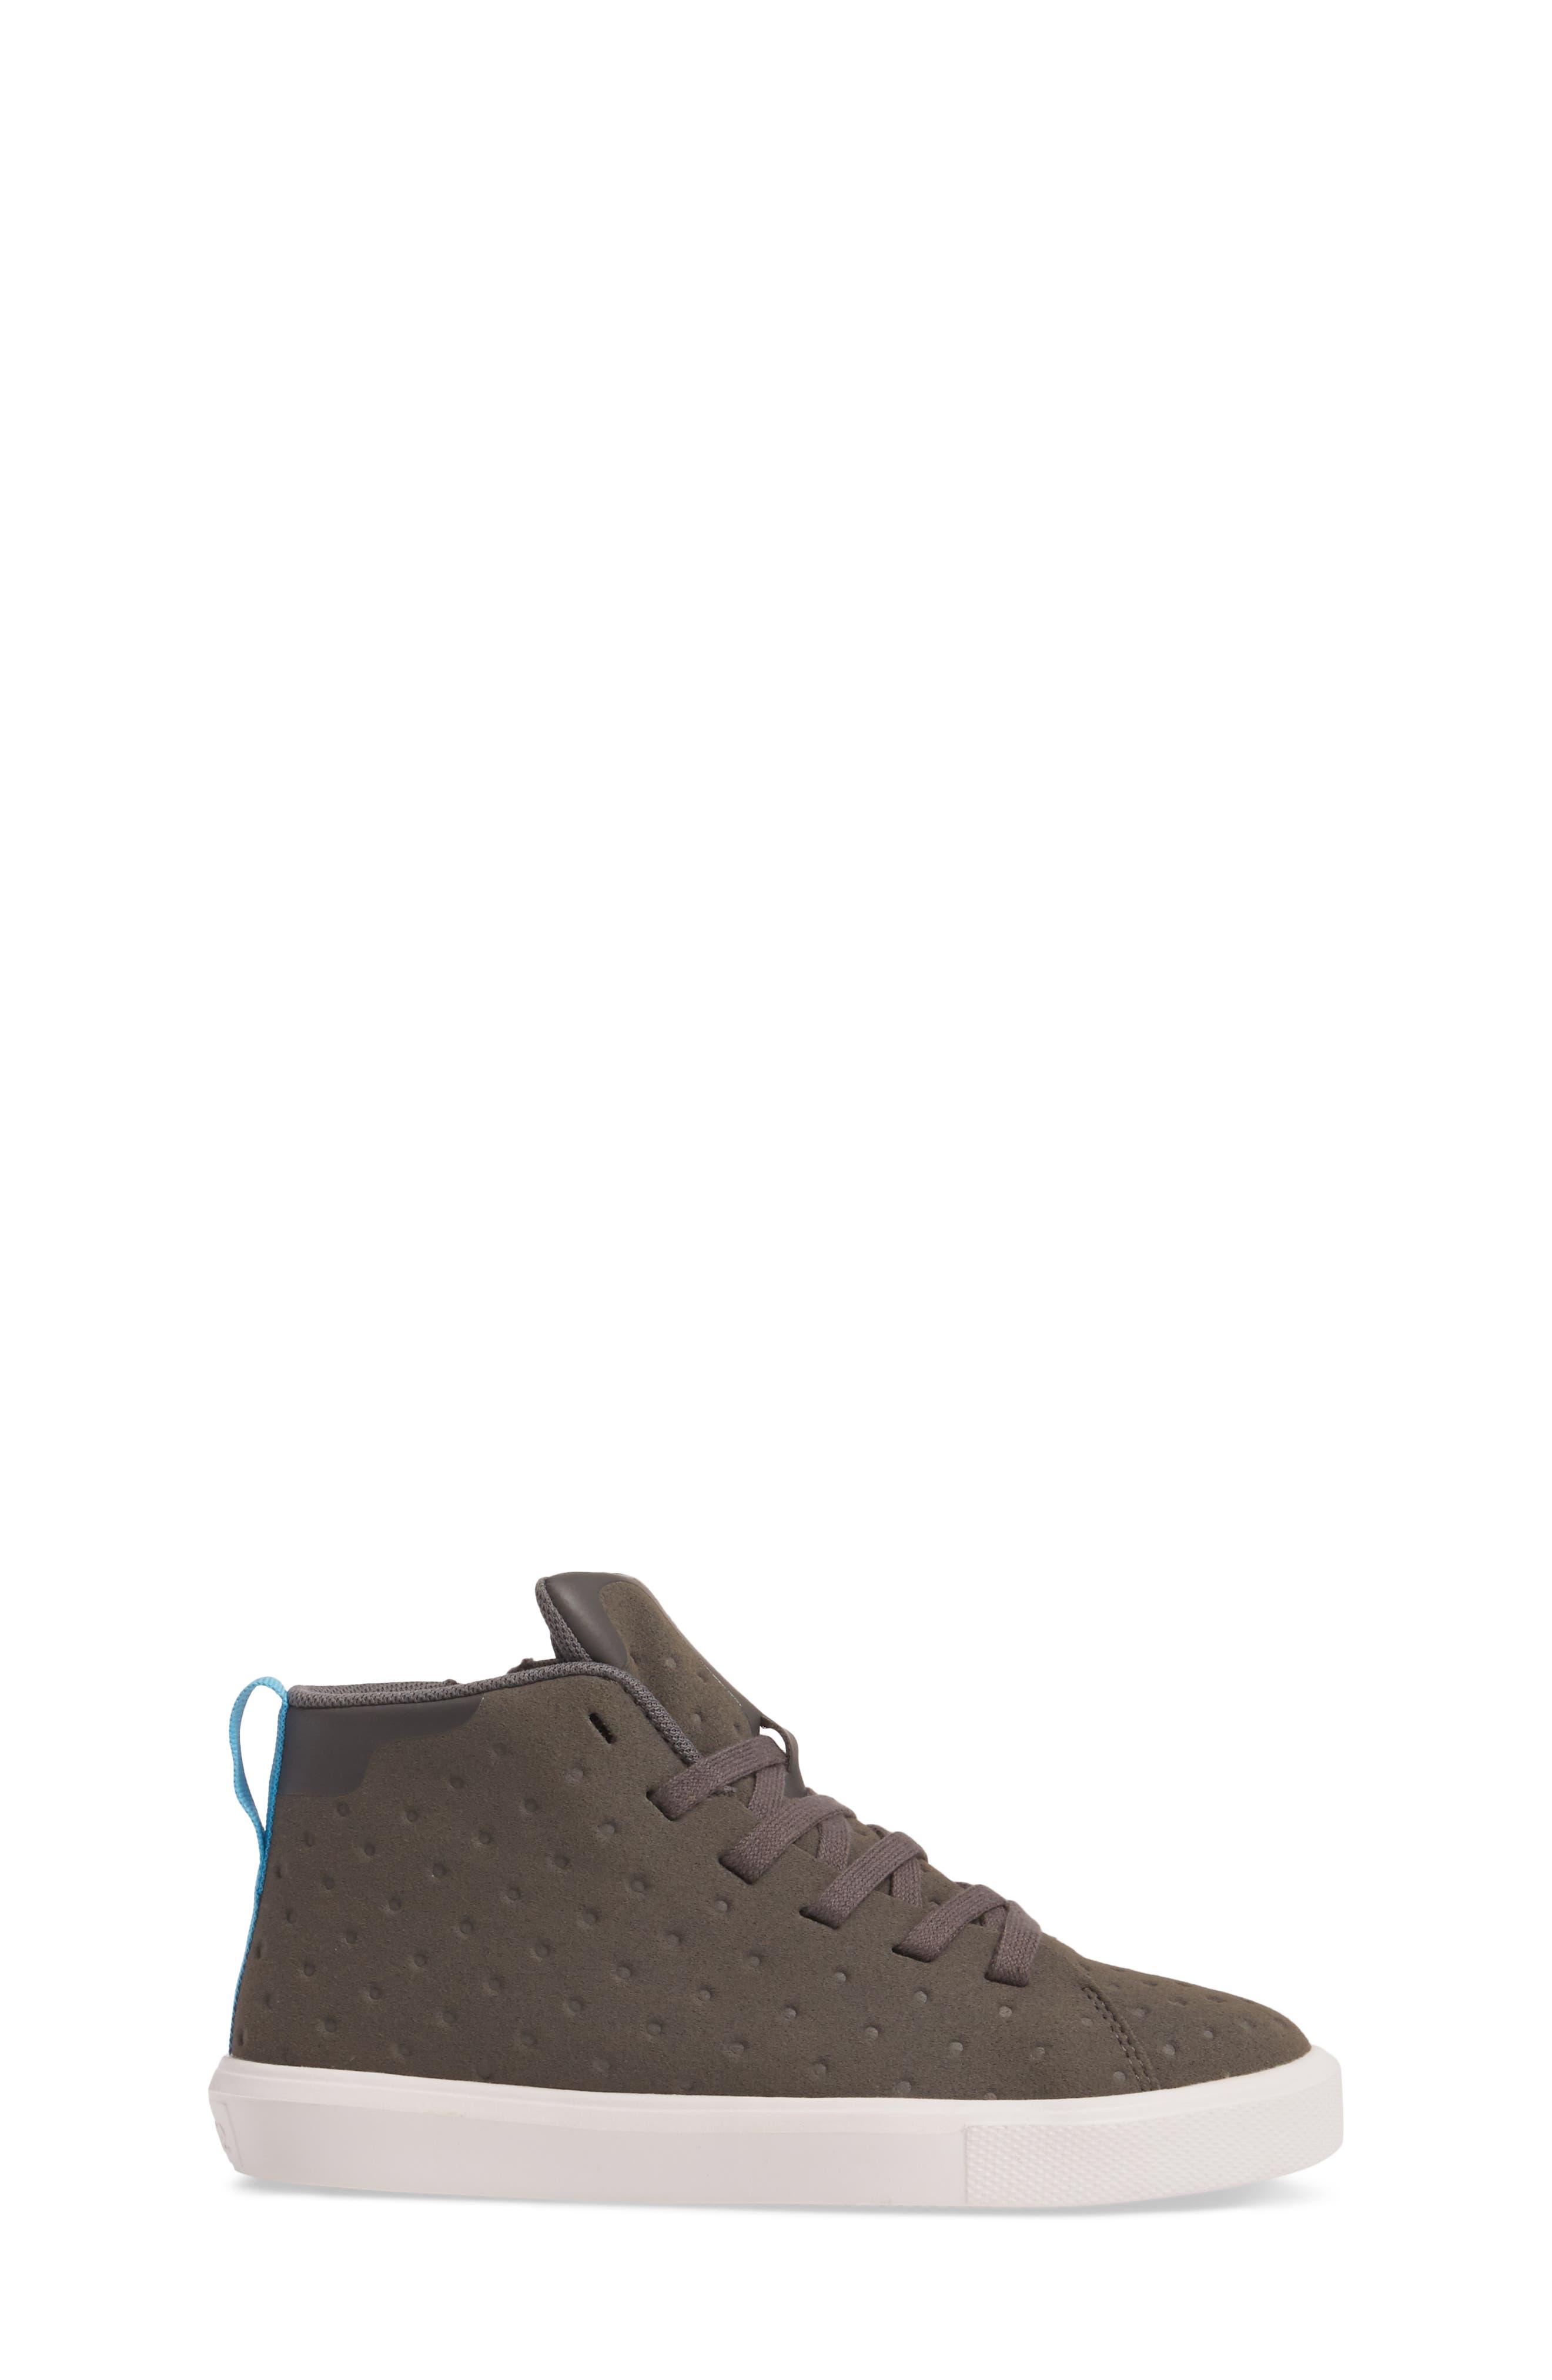 Native Monaco Sneaker,                             Alternate thumbnail 3, color,                             024